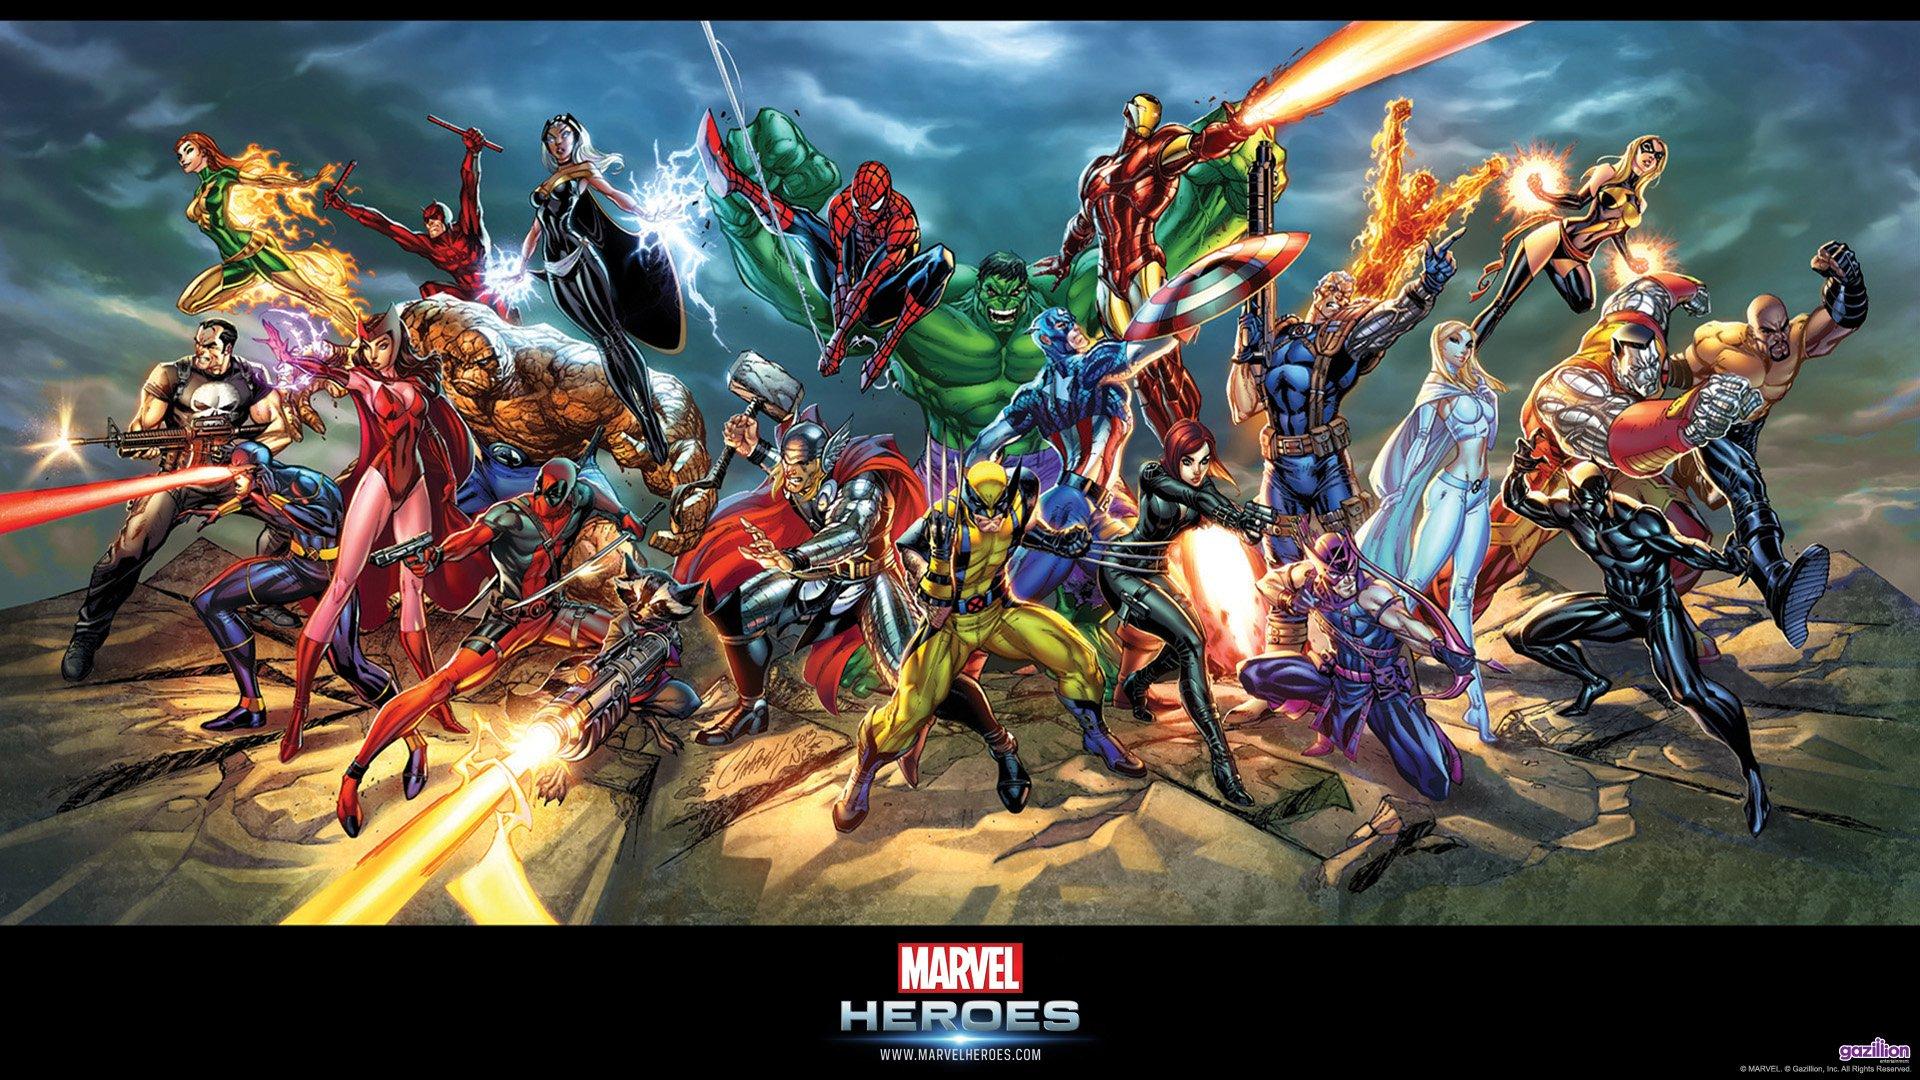 Source httpslotsmarvelcomepic marvel heroes wallpapers 1920x1080